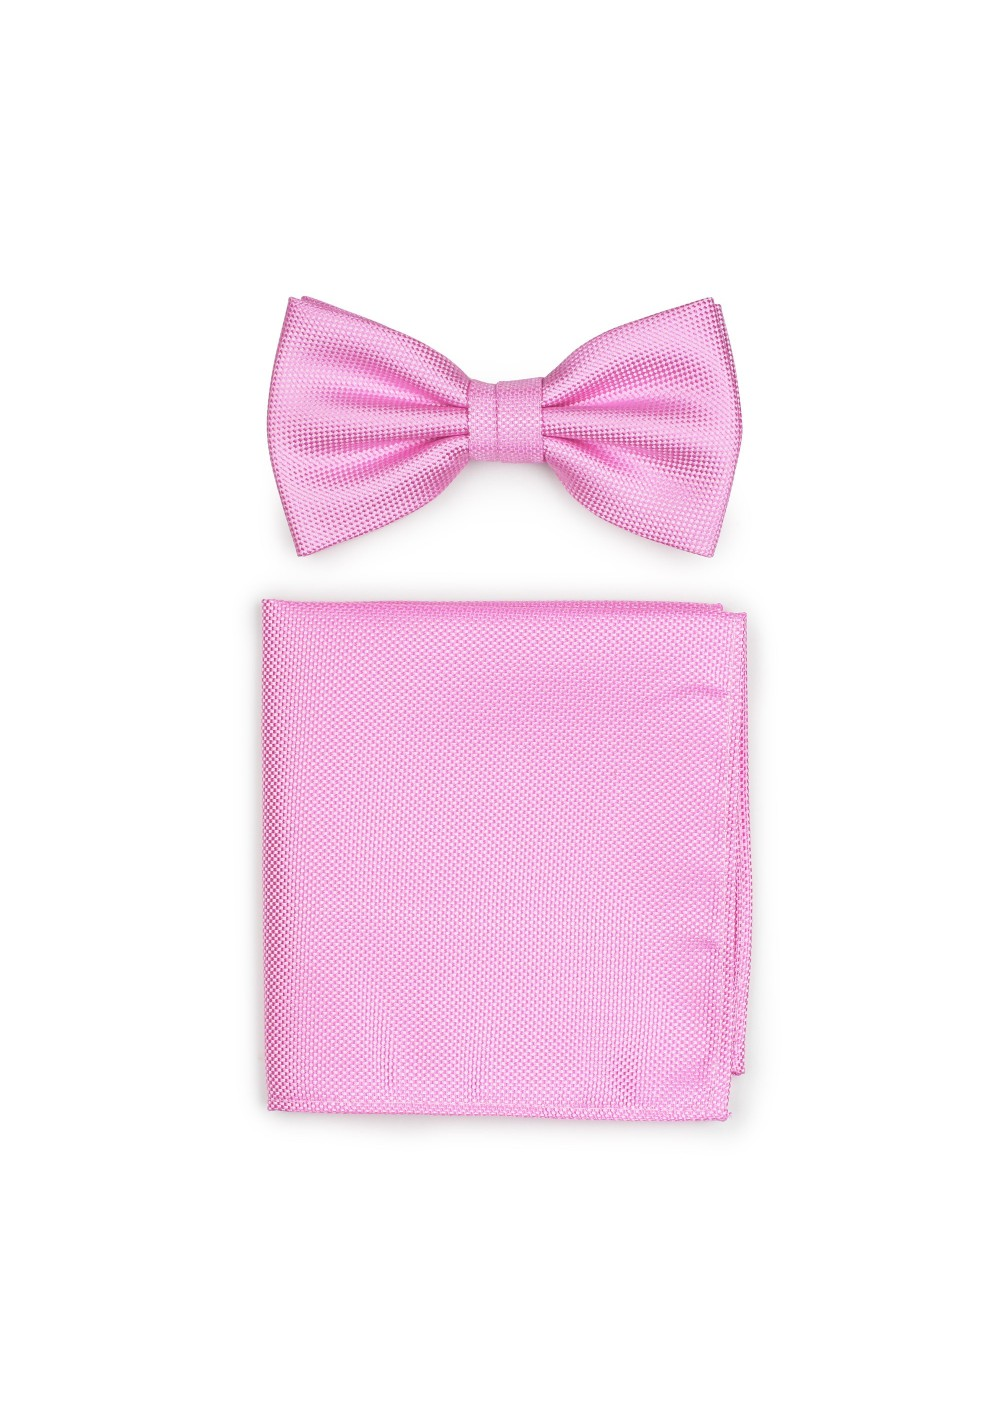 Carnation Pink Bowtie Set in Matte Finish